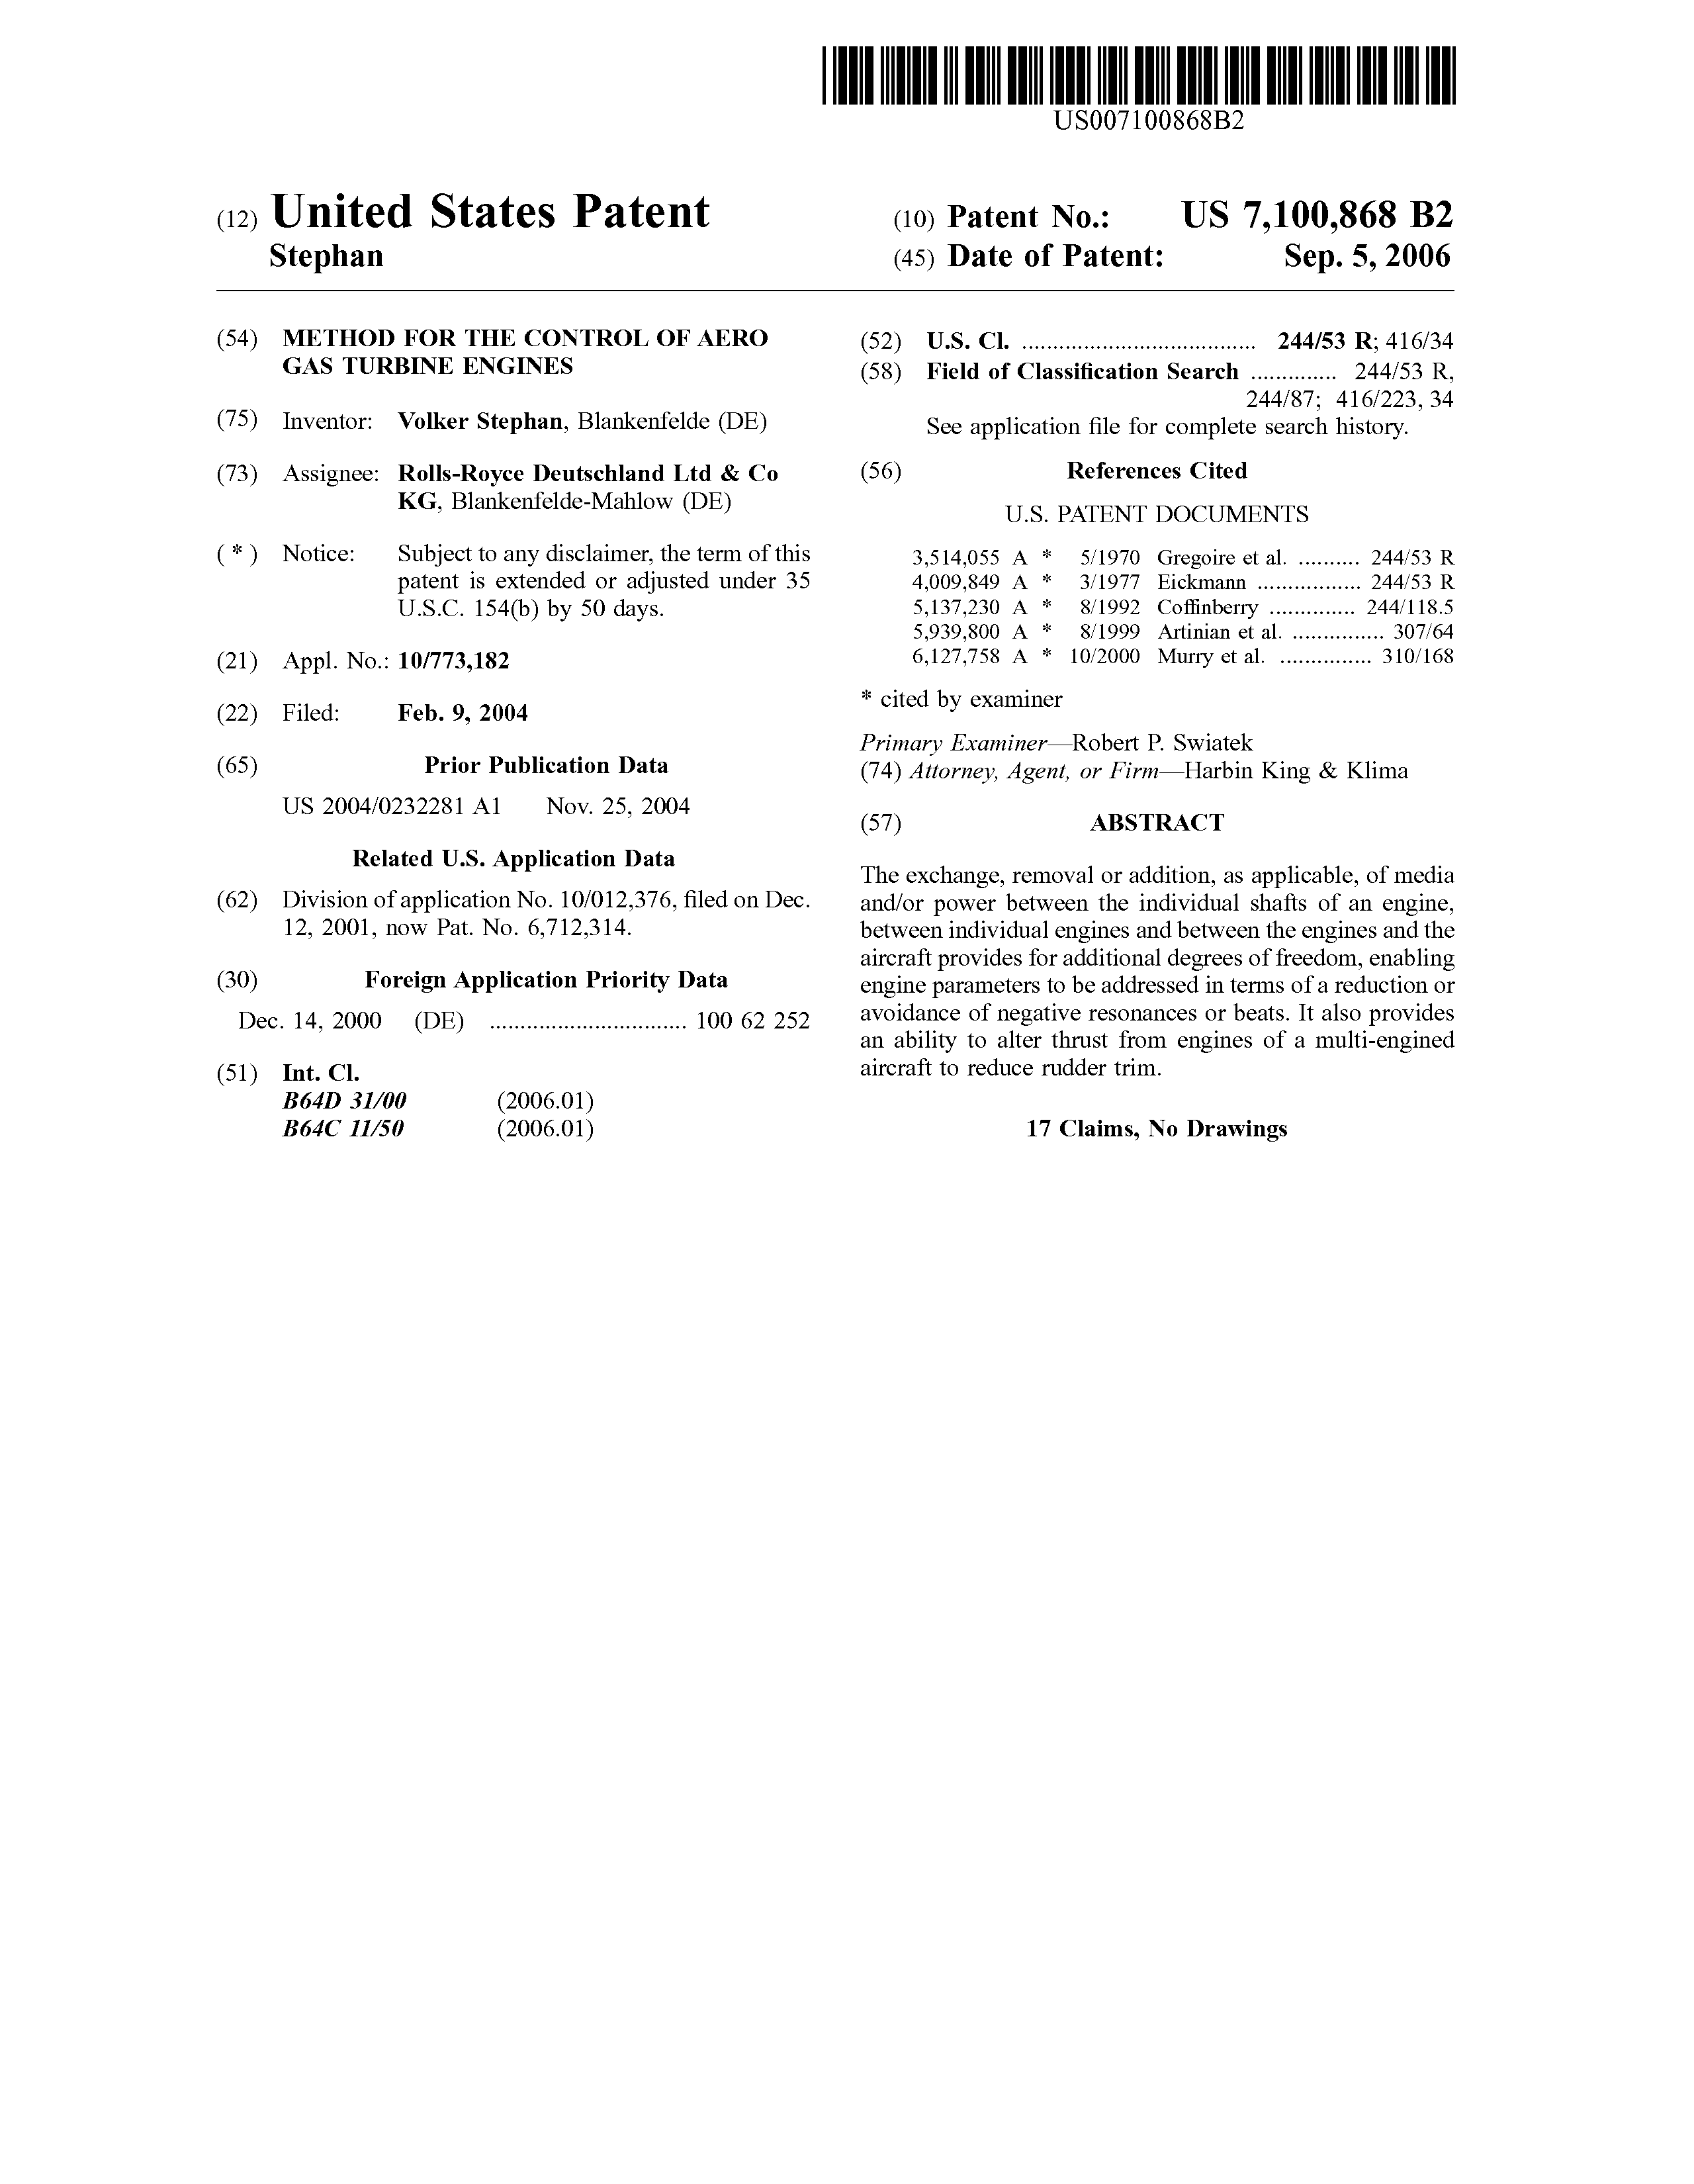 Patent US Method for the control of aero gas turbine